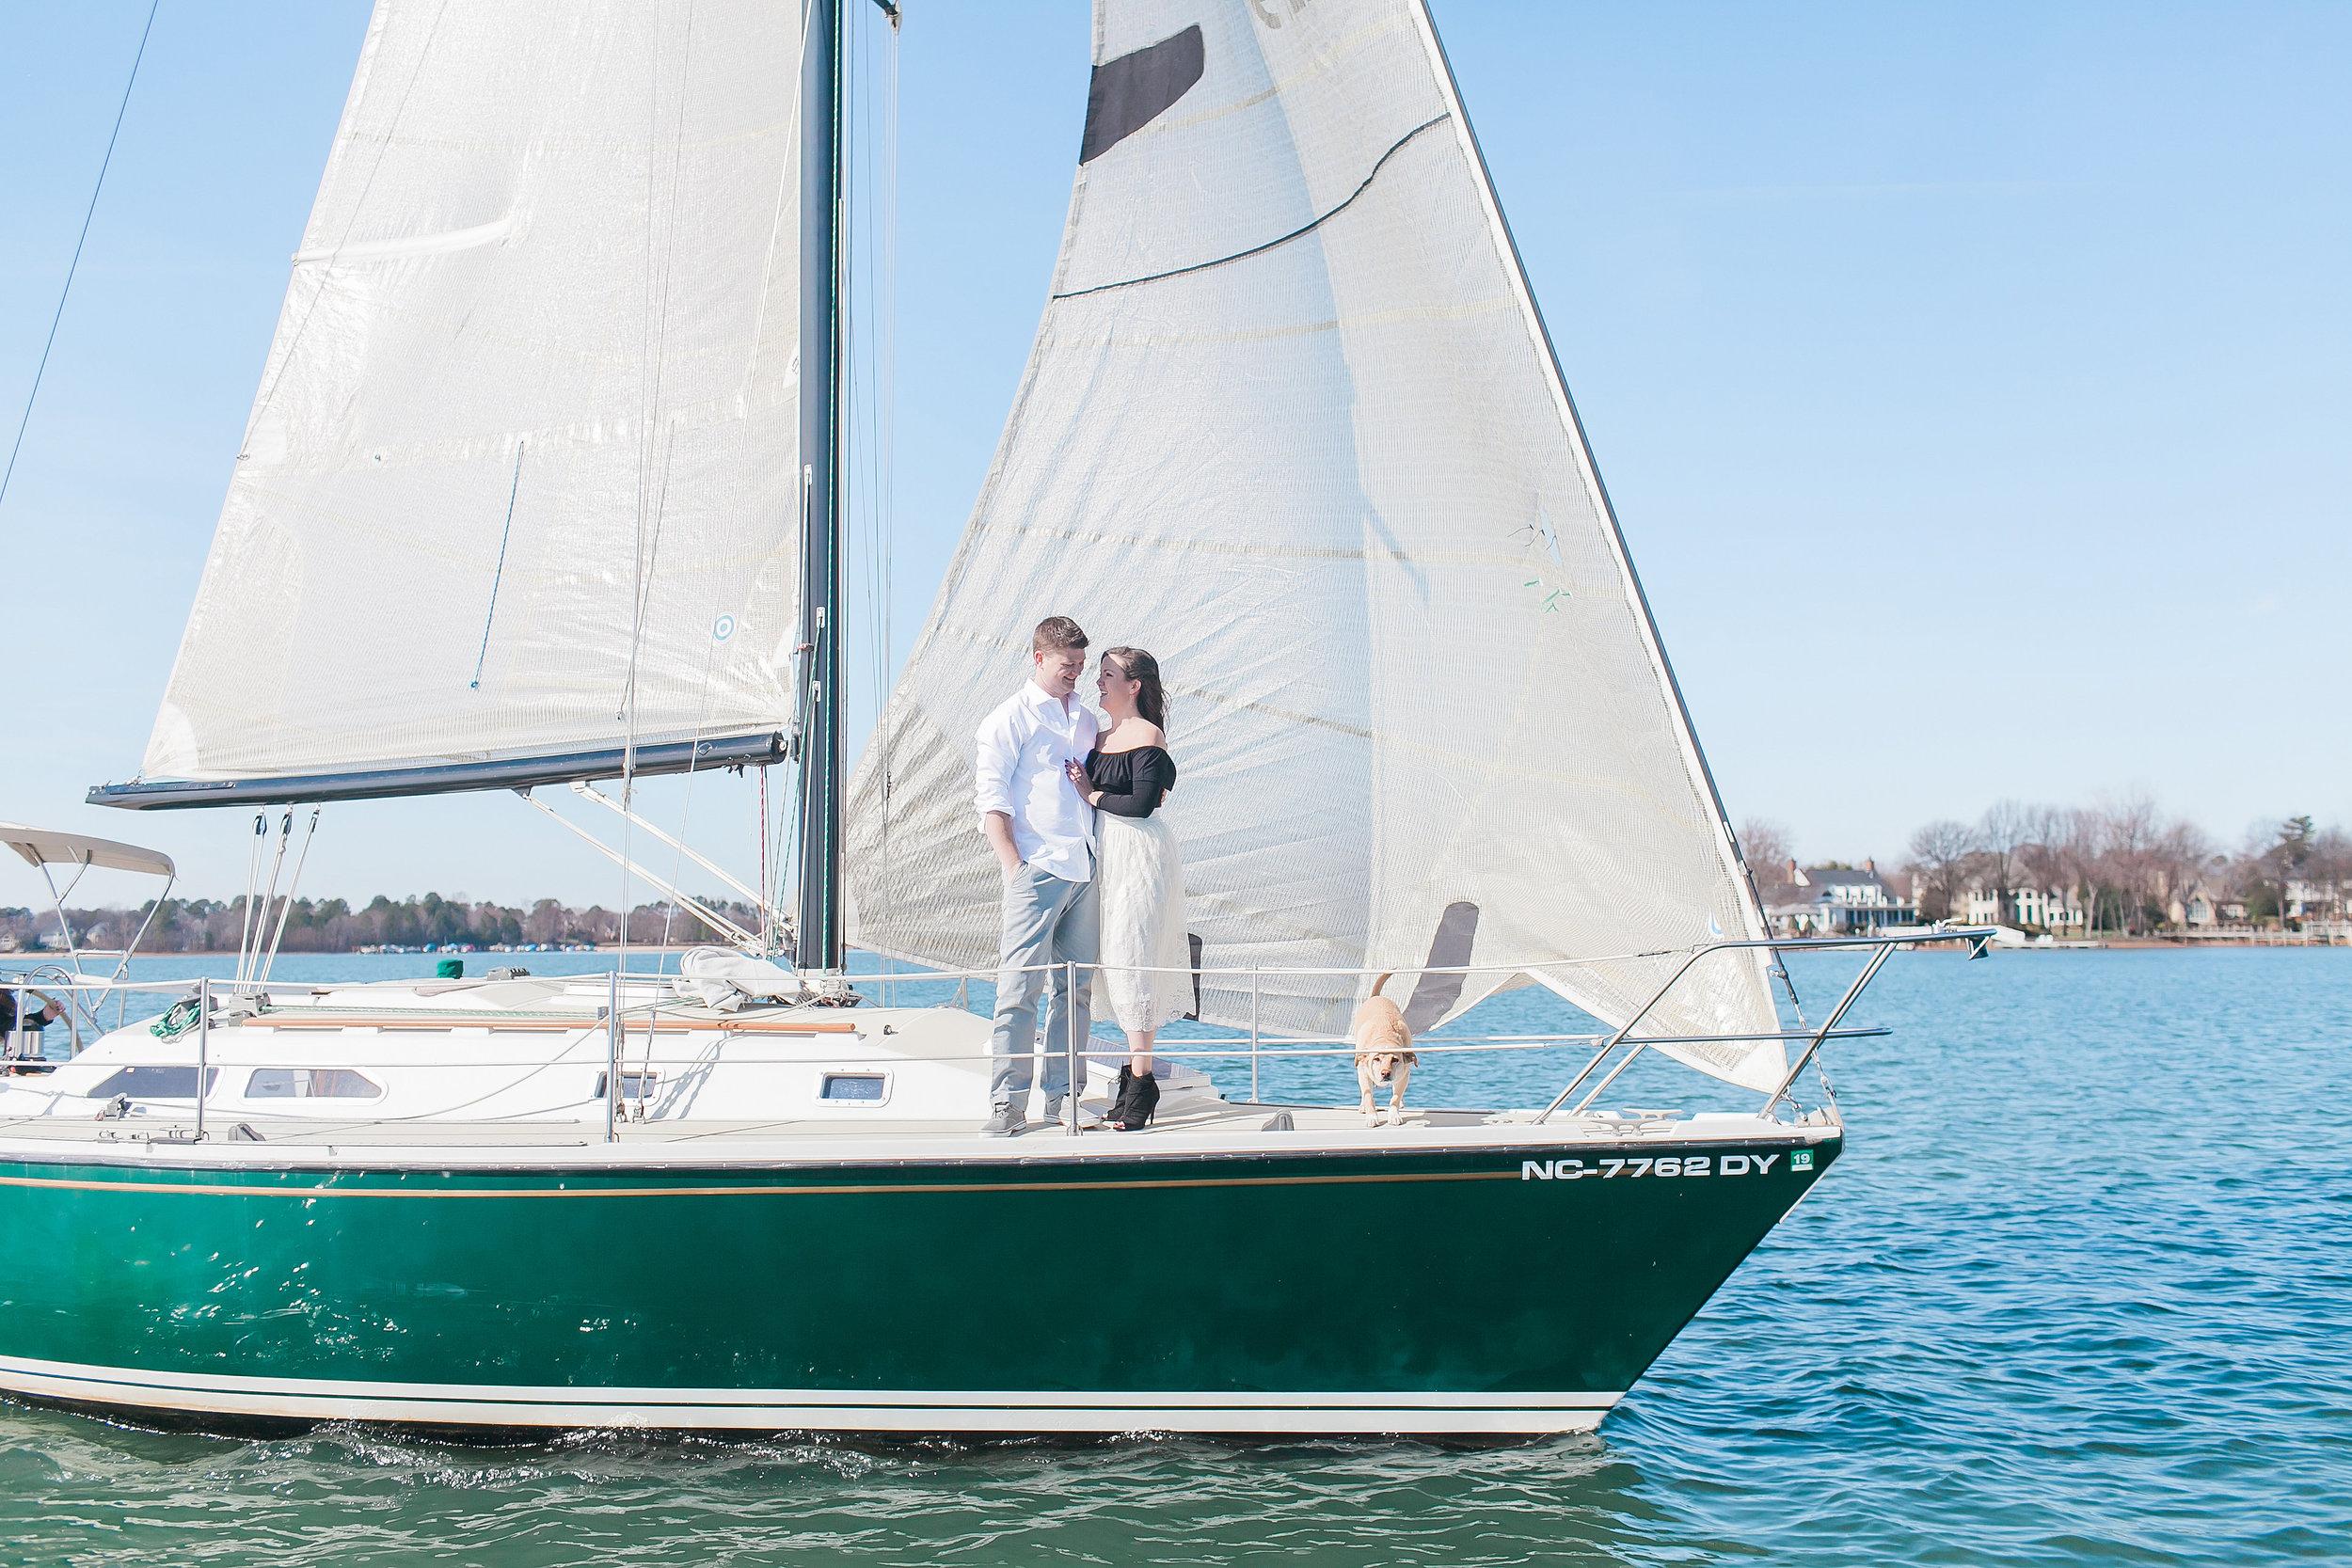 Sailboat Engagement Photos - Charlotte, North Carolina Wedding Photography